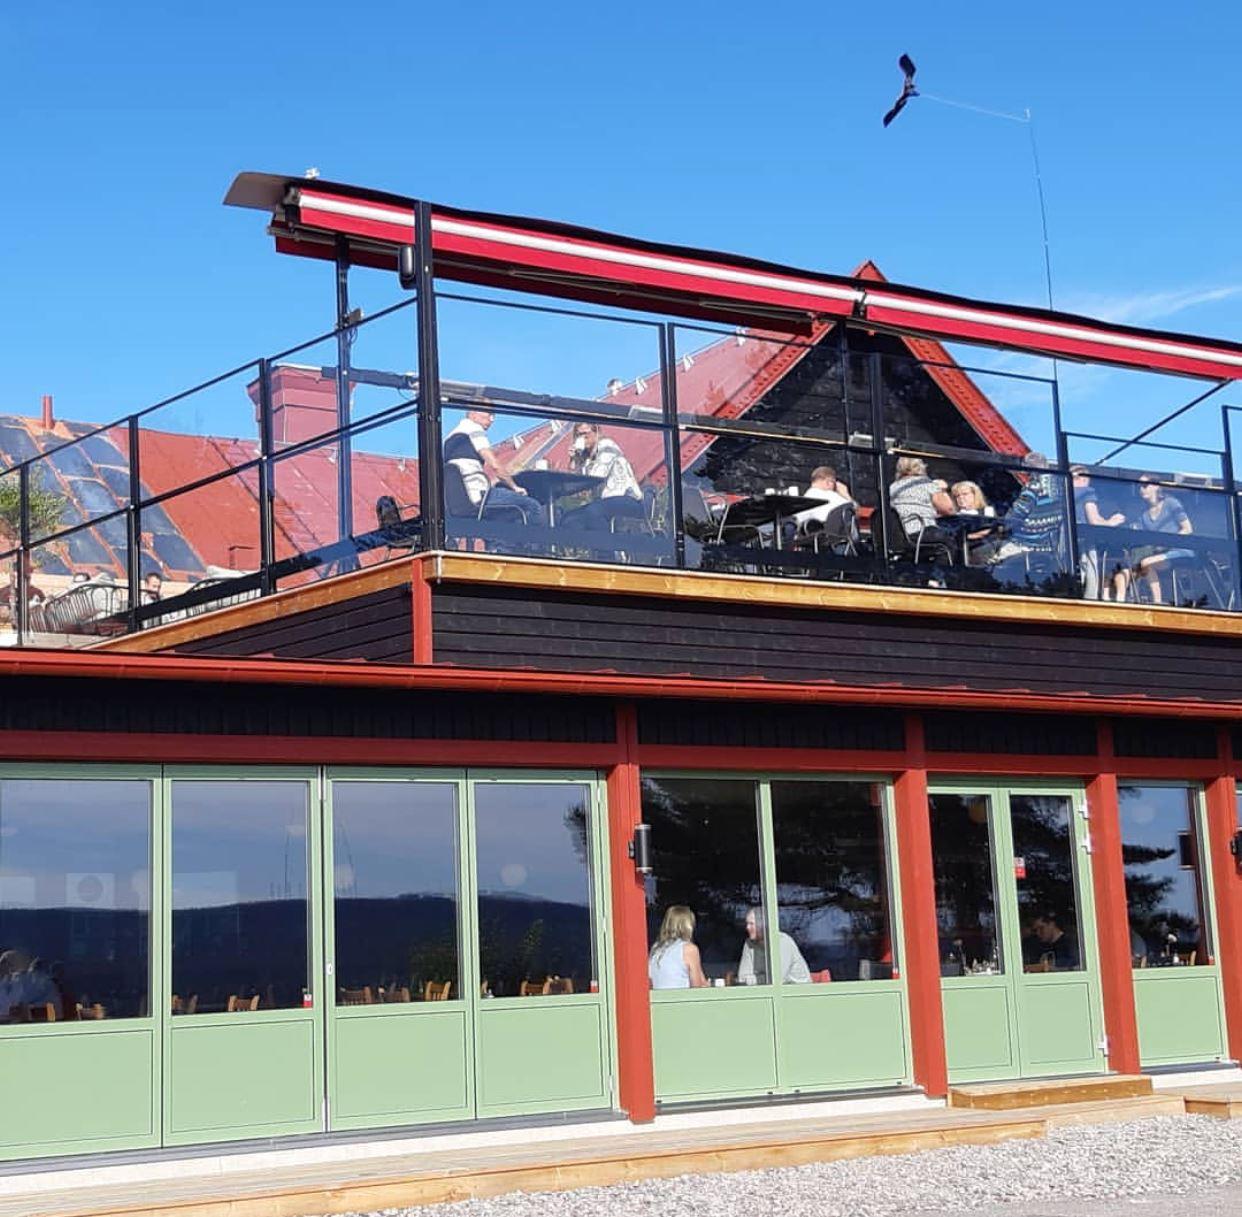 Karta Sundsvall Centralstation.Visit Sundsvall Restaurang Grankotten Karta Restauranger Sundsvall